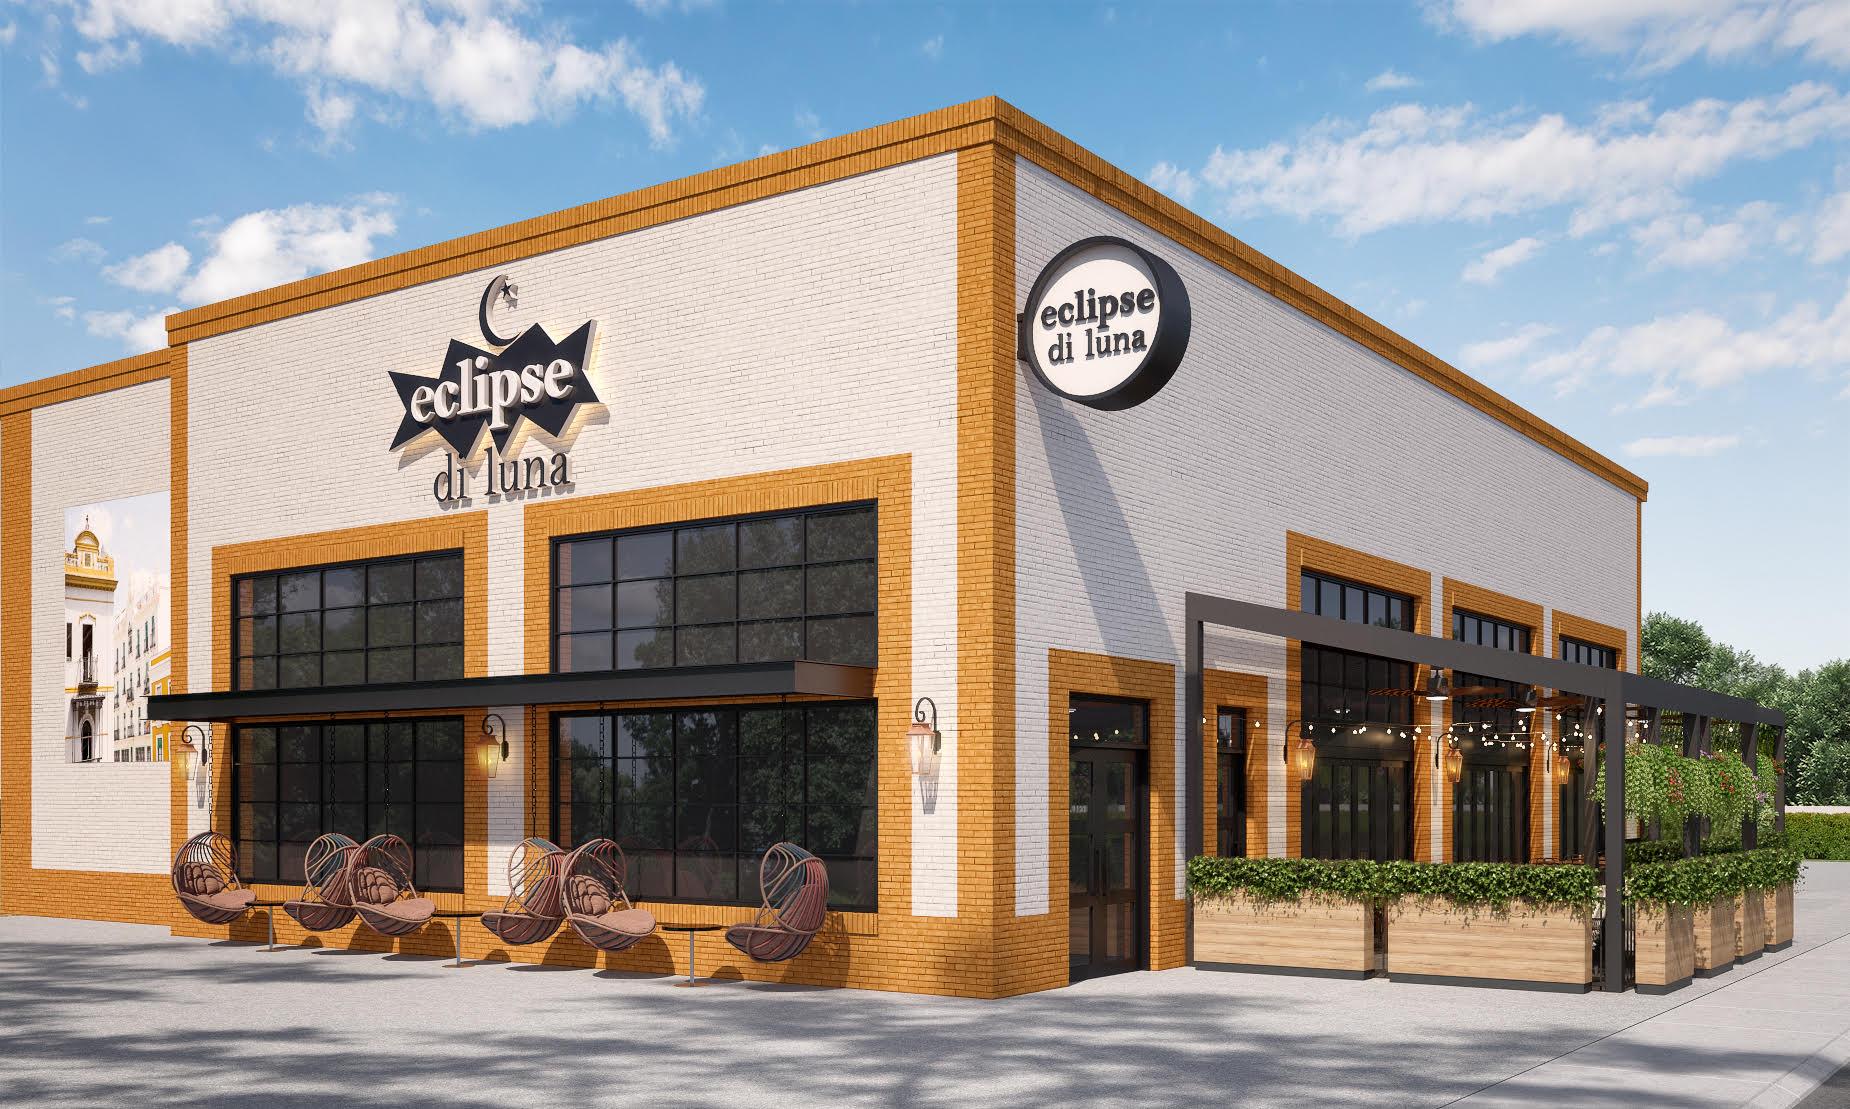 Popular Atlanta restaurant Eclipse di Luna Restaurant and Tapas Bar opens in spring 2022 at Halcyon in Alpharetta.